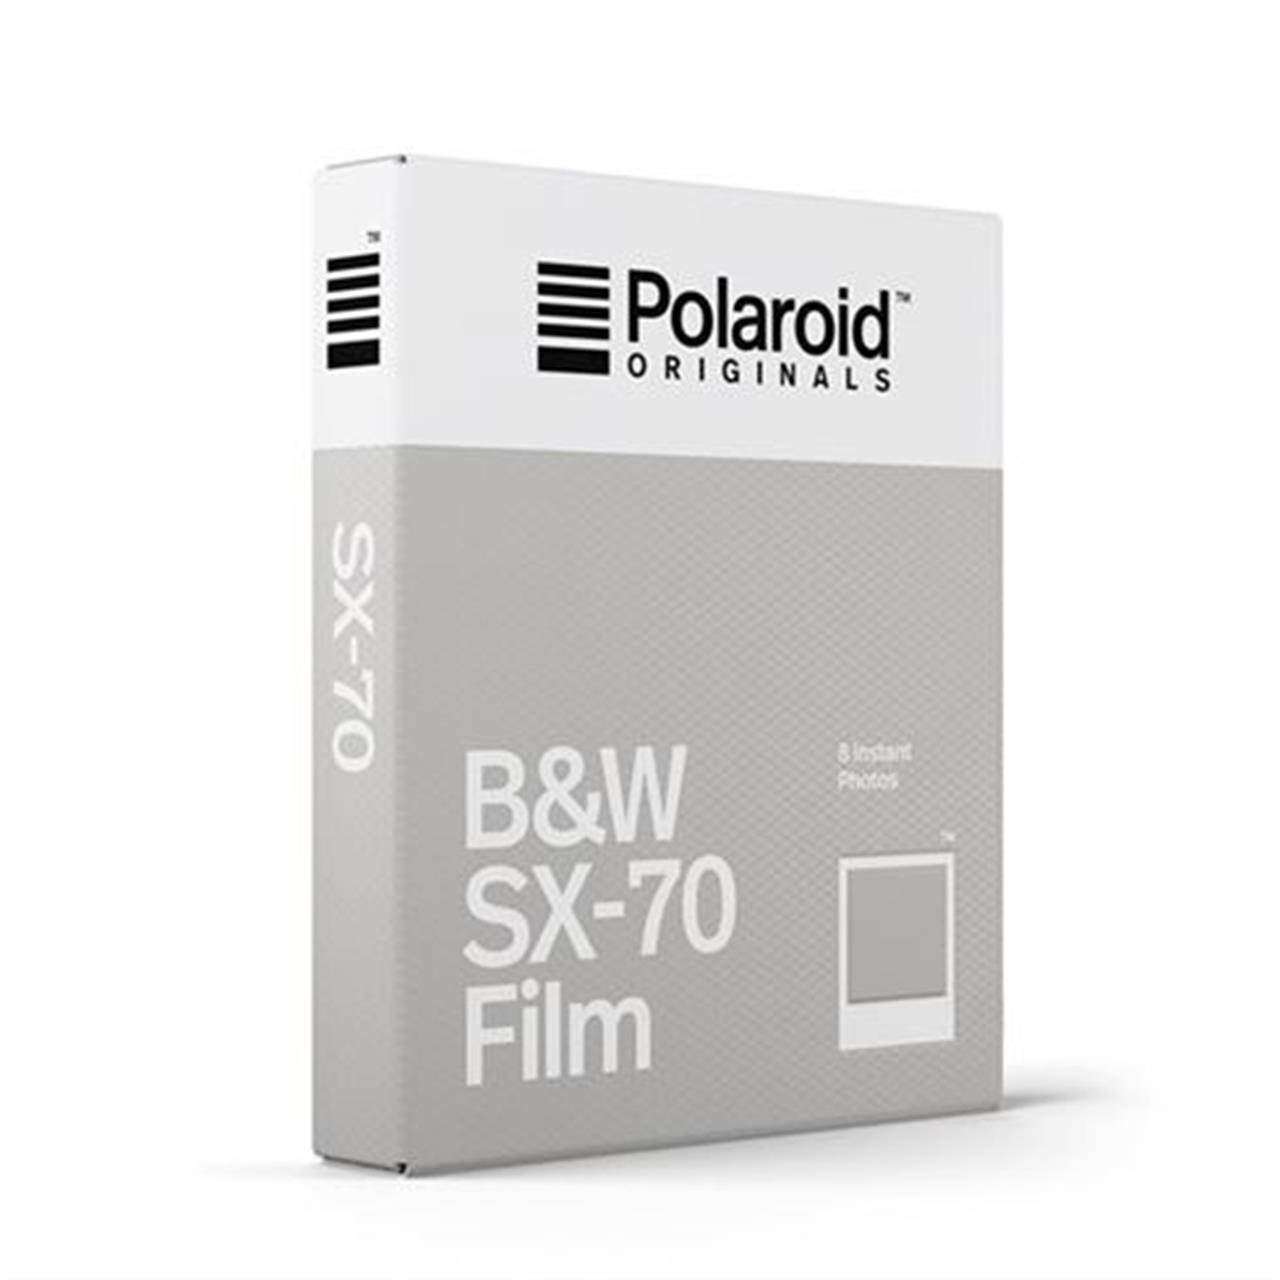 9120066087805__polaroid_zwart-wit_sx70_film.jpg